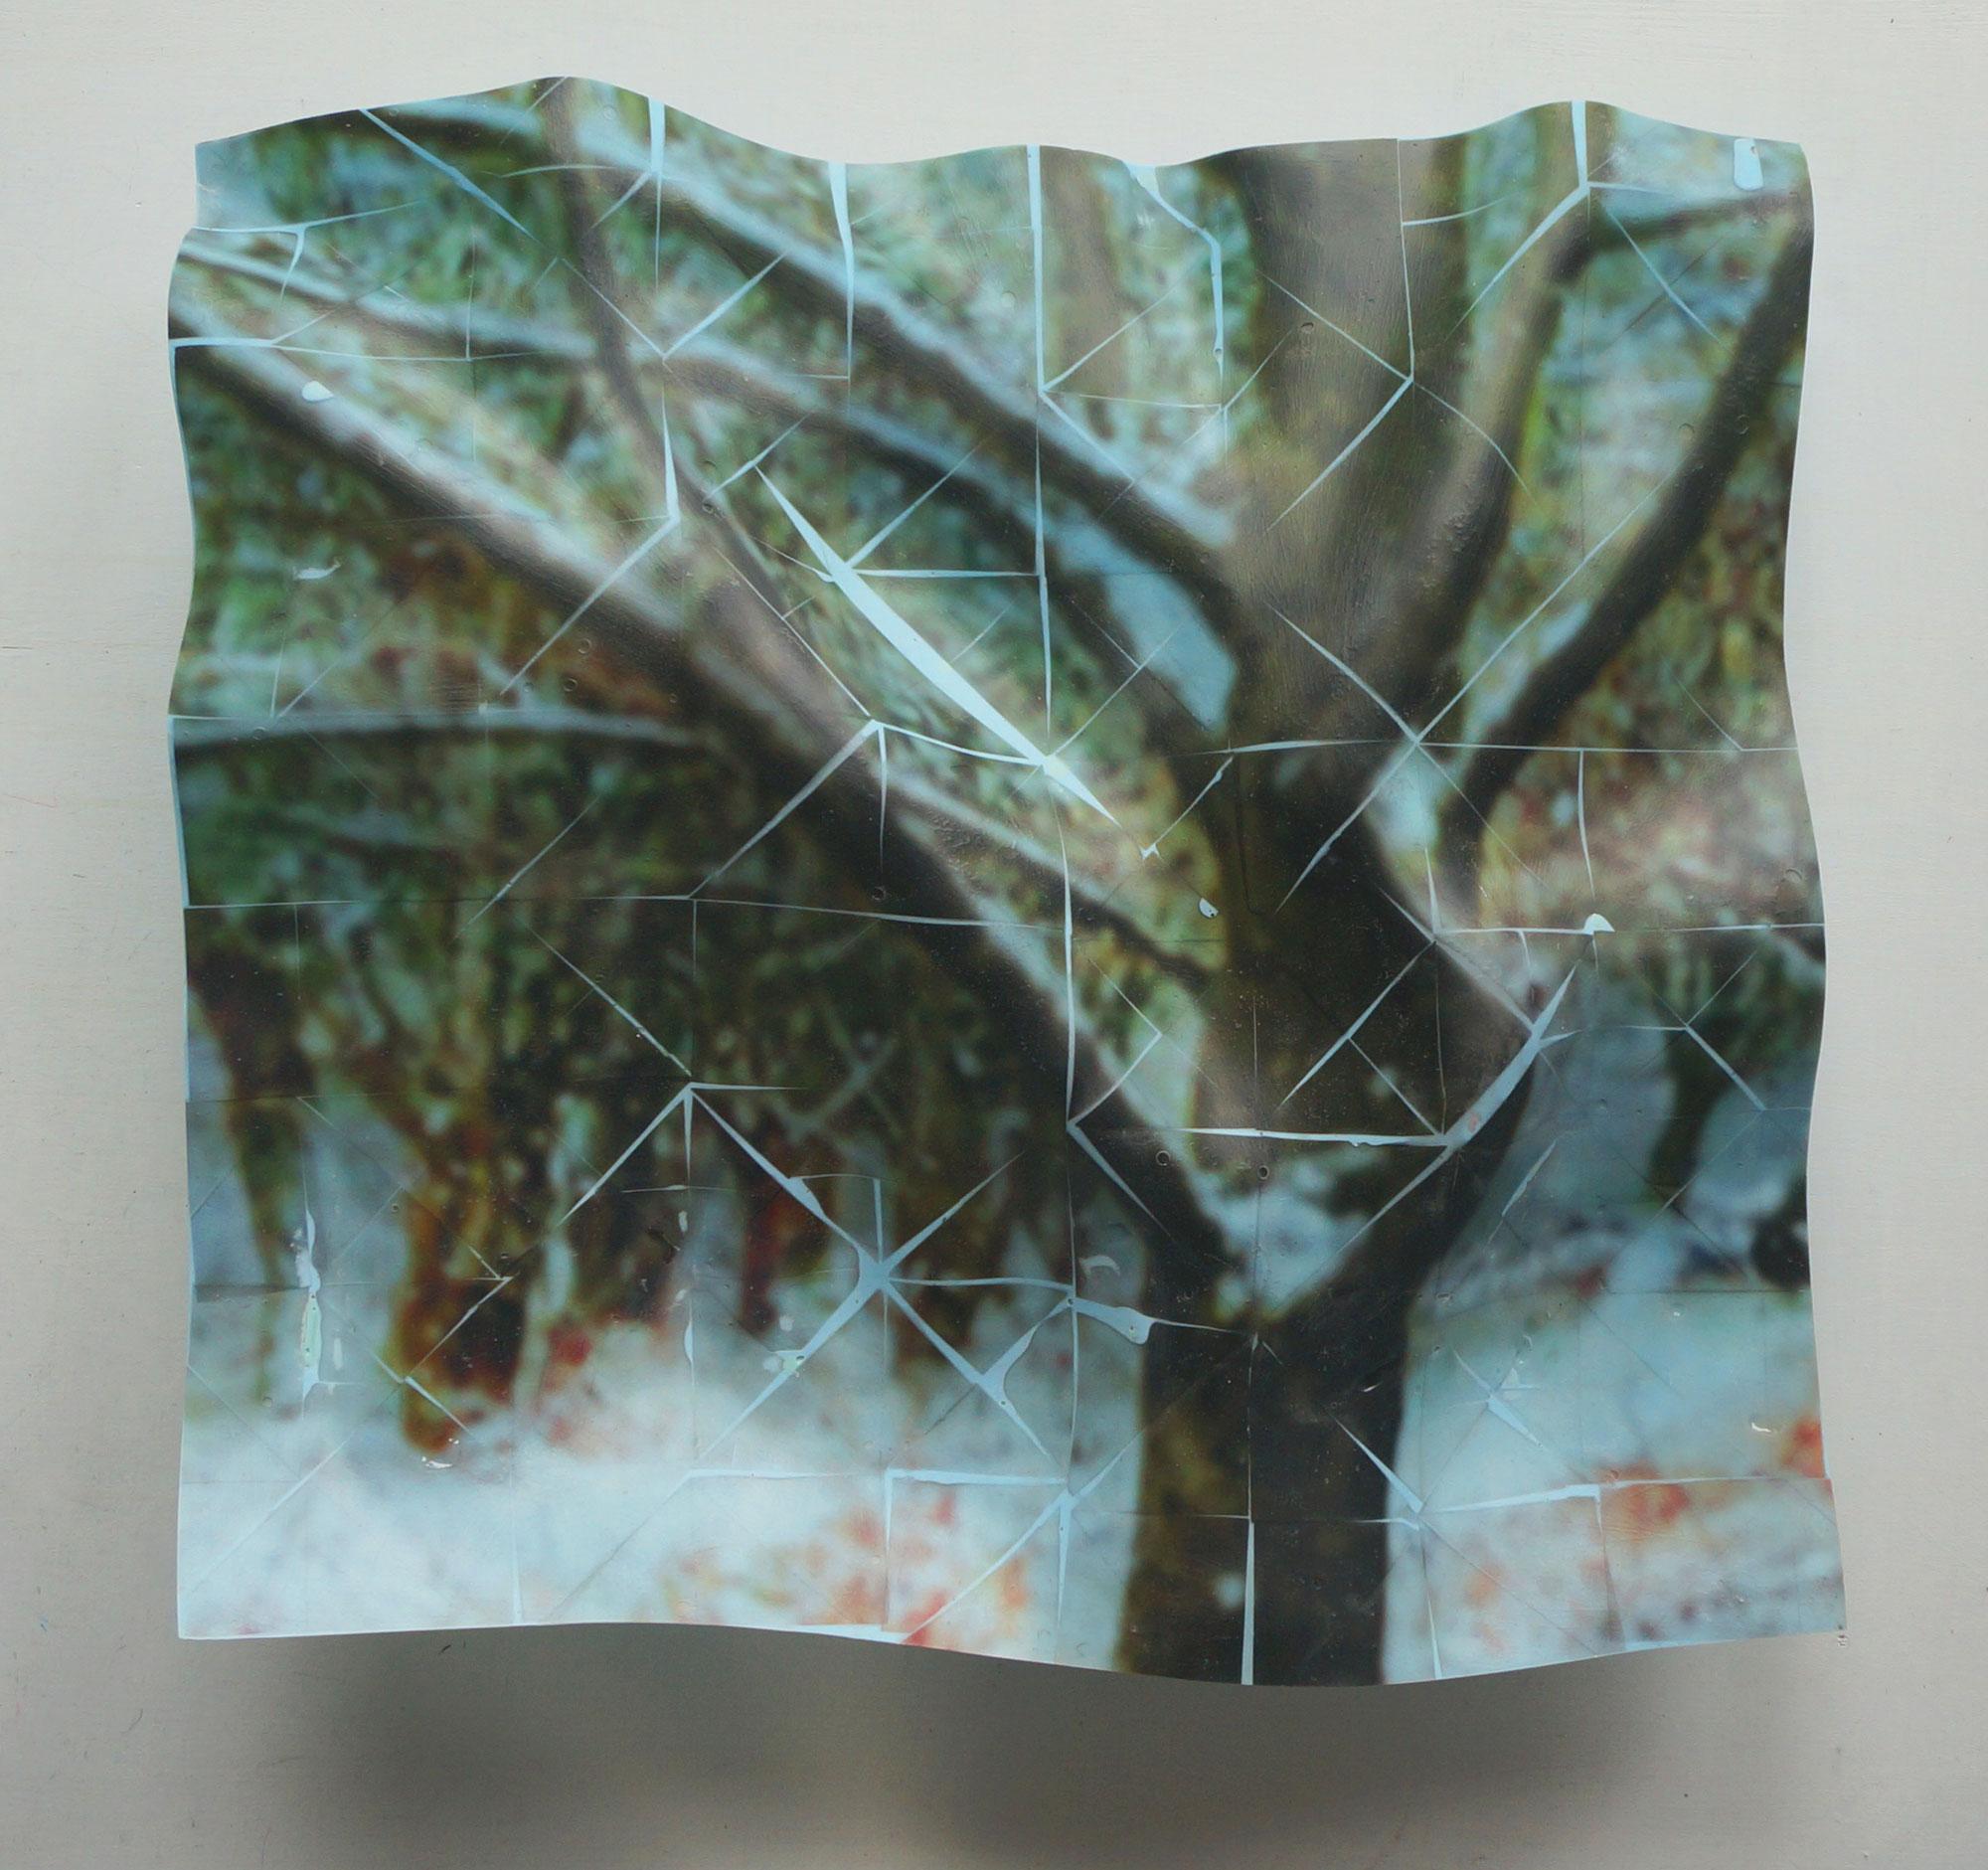 Winter Tree (Version 2), 2021, 45x46x11cms